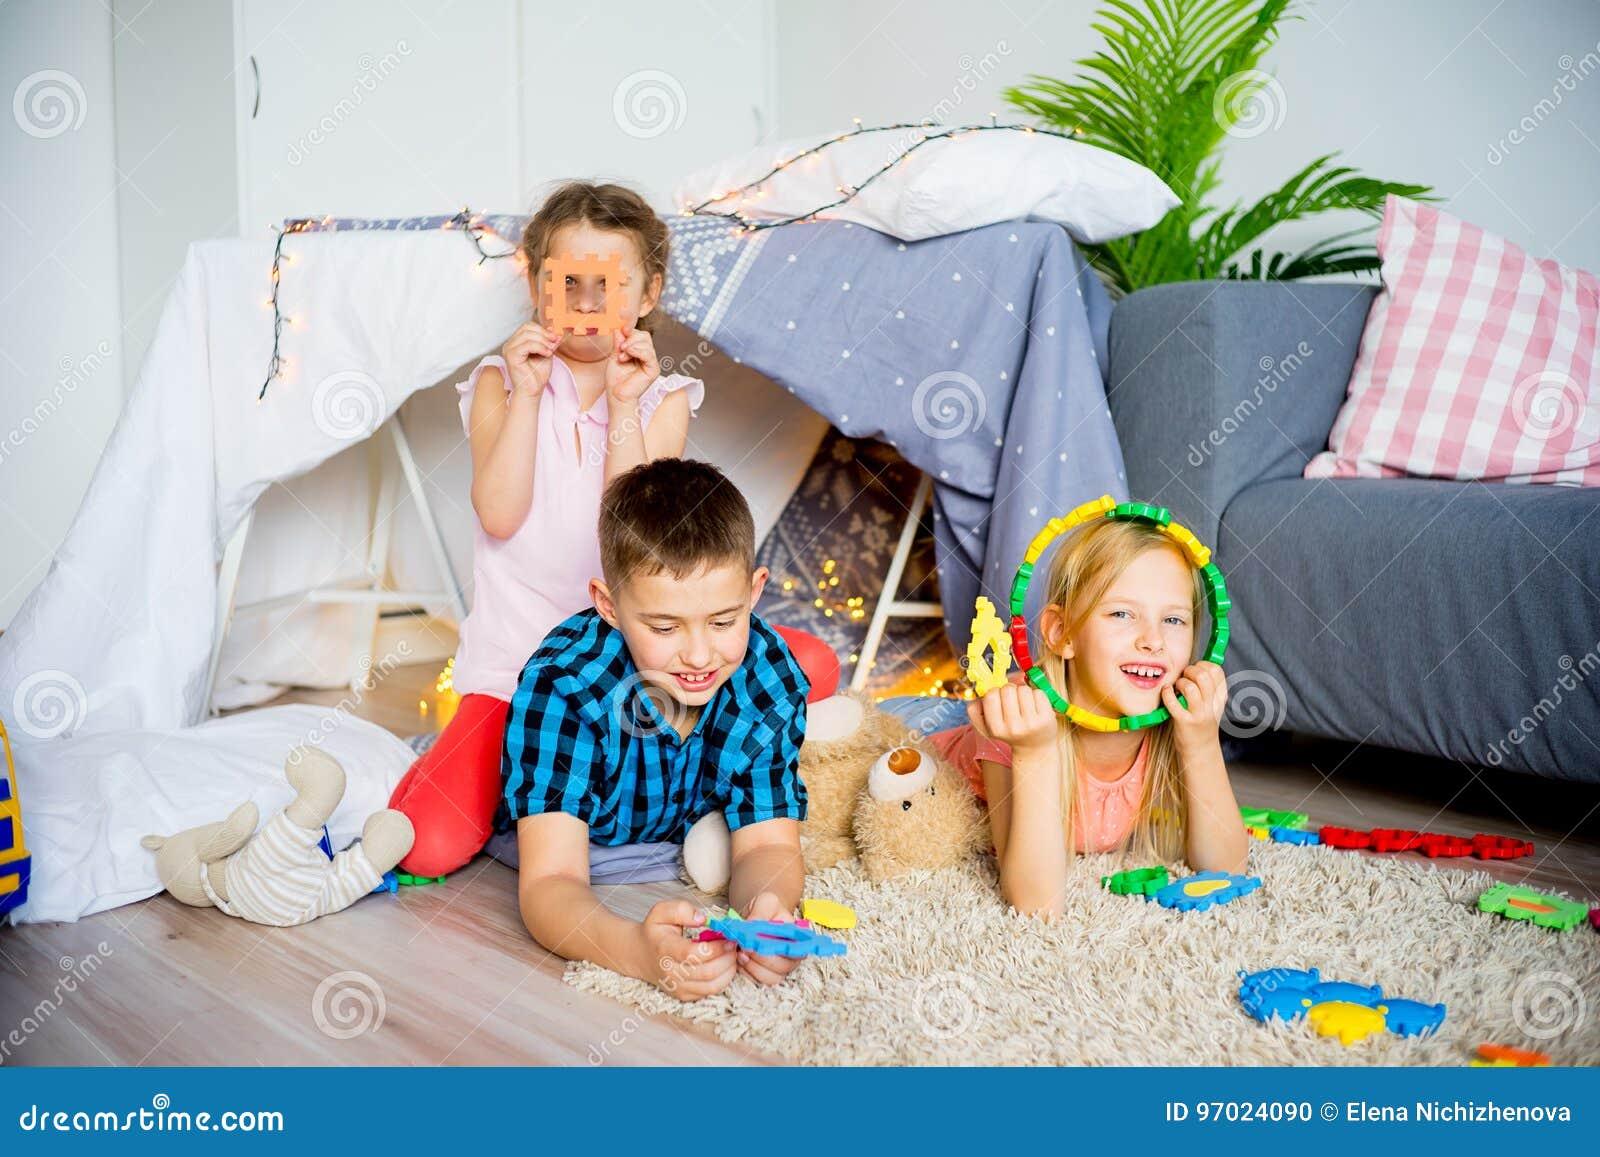 Kids in a teepee